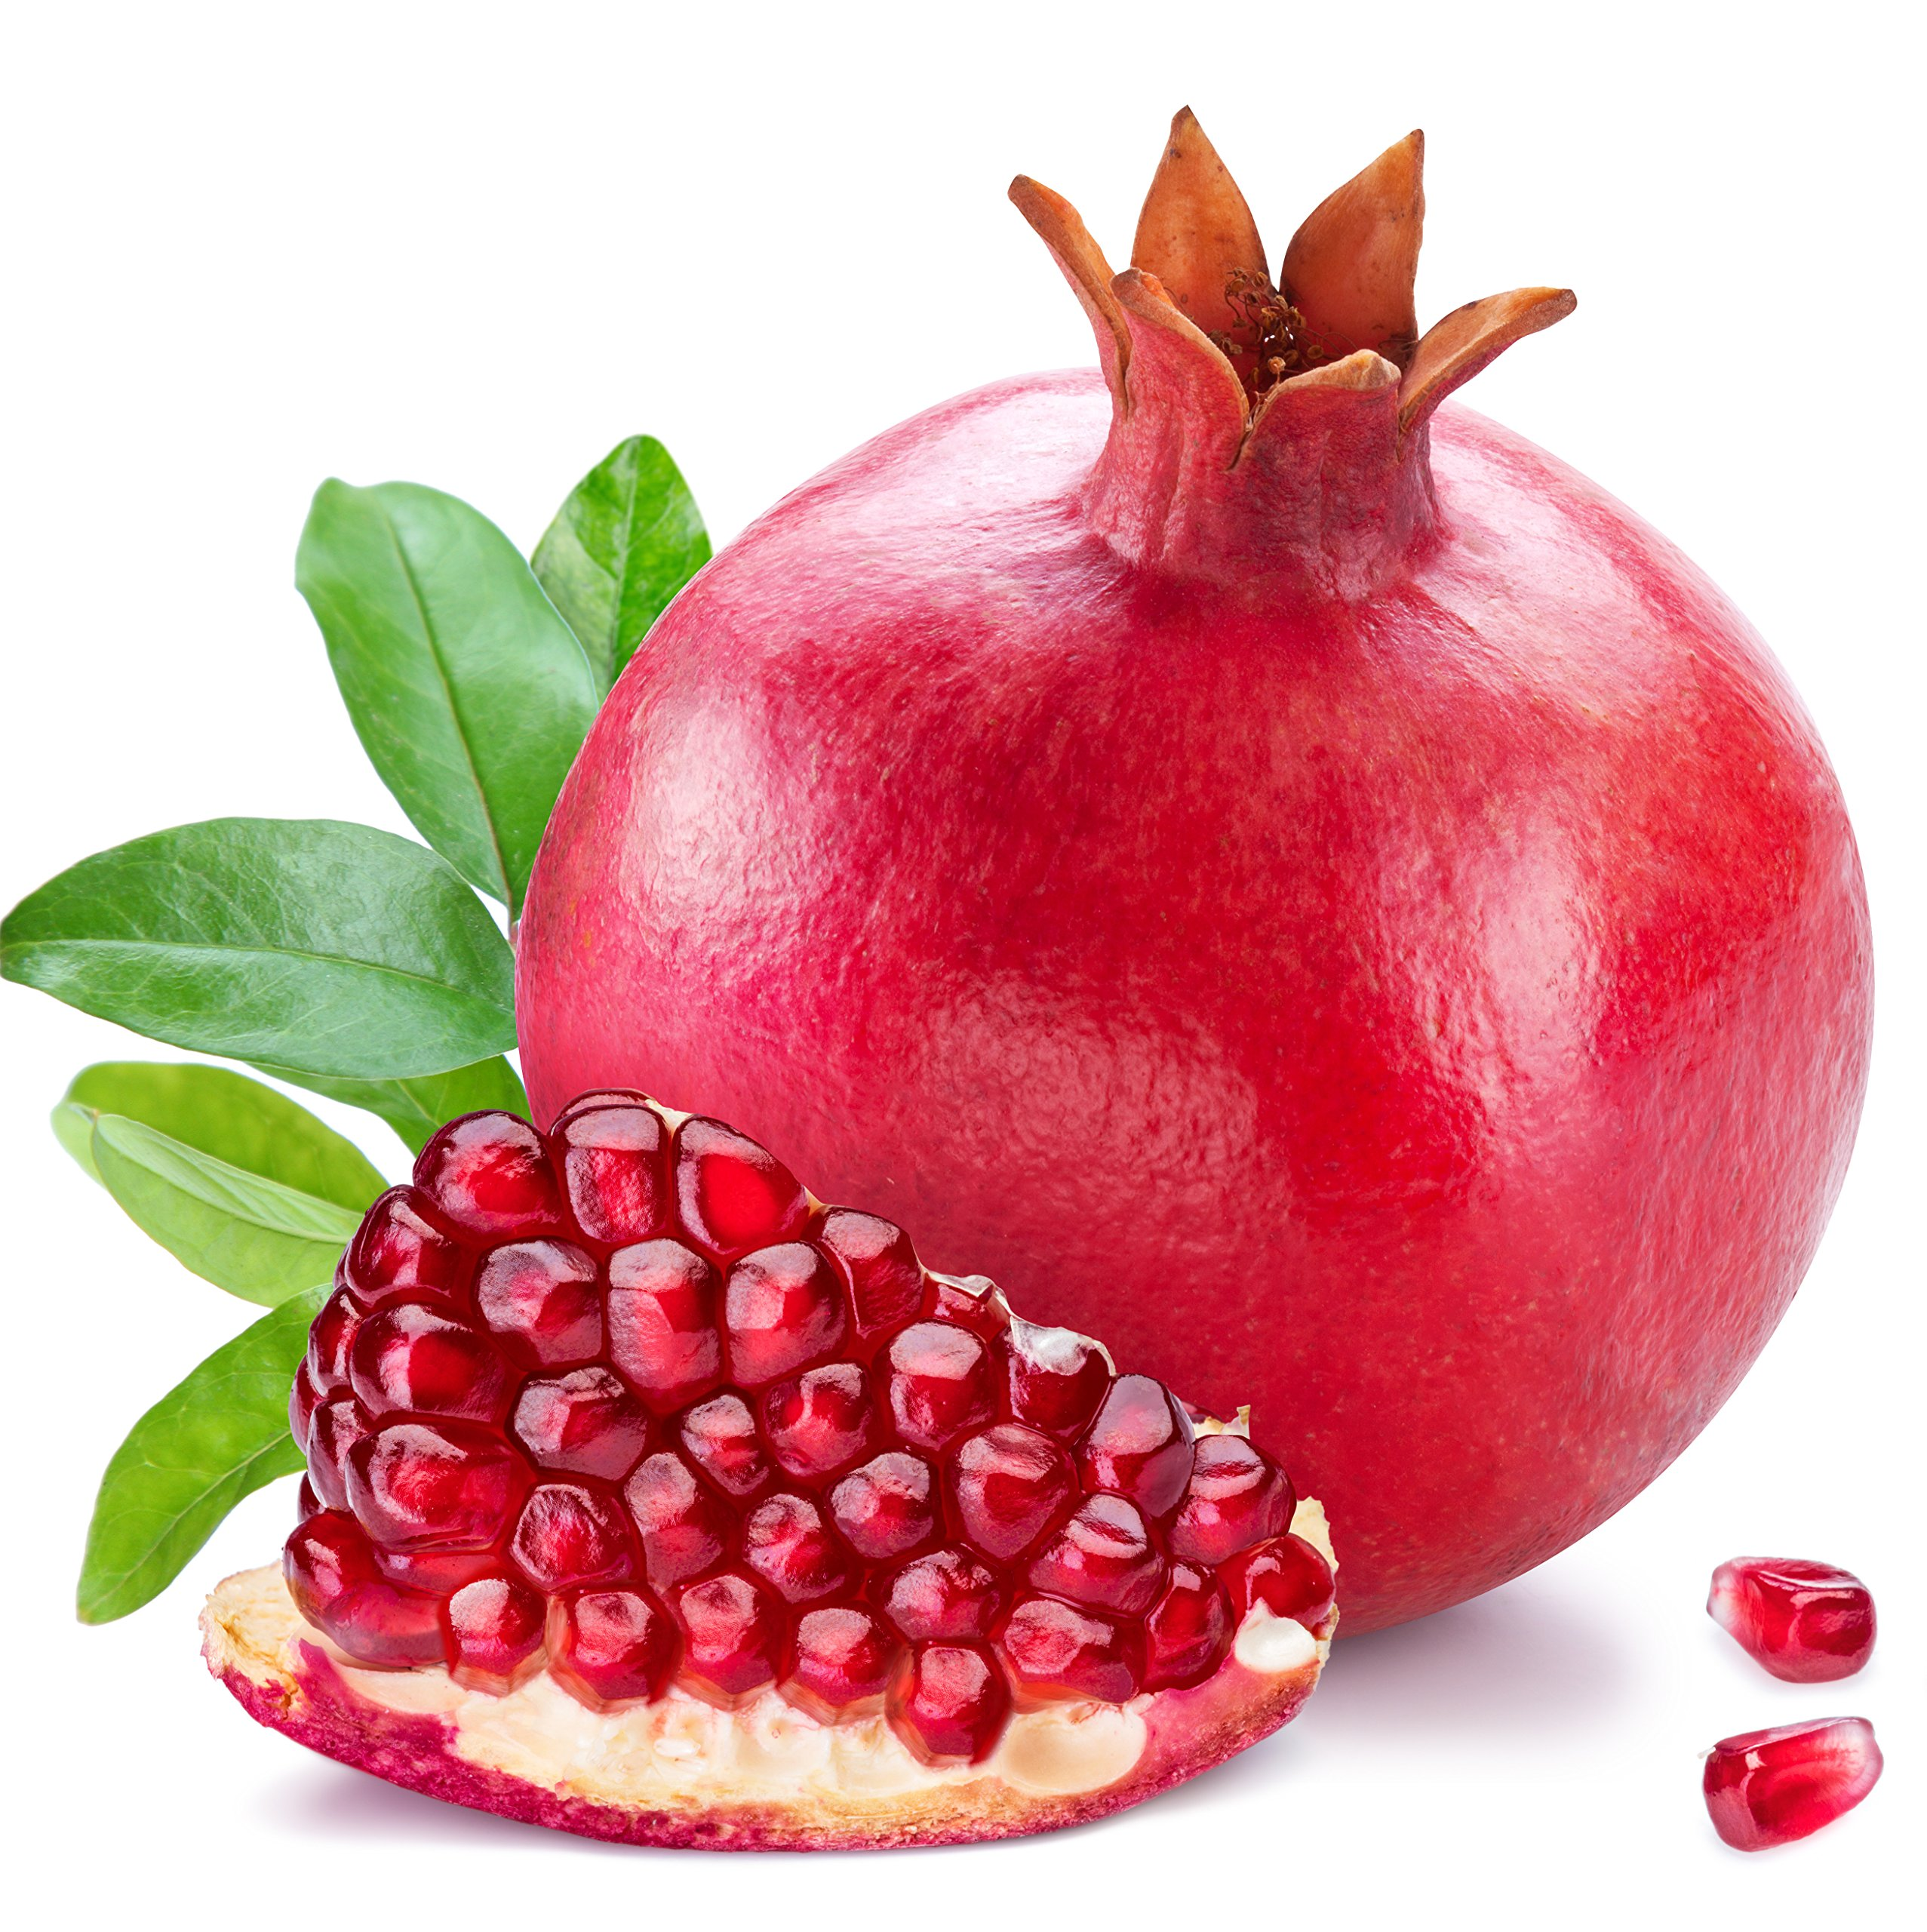 Pomegranate Wonderful Punica granatum LIVE PLANT